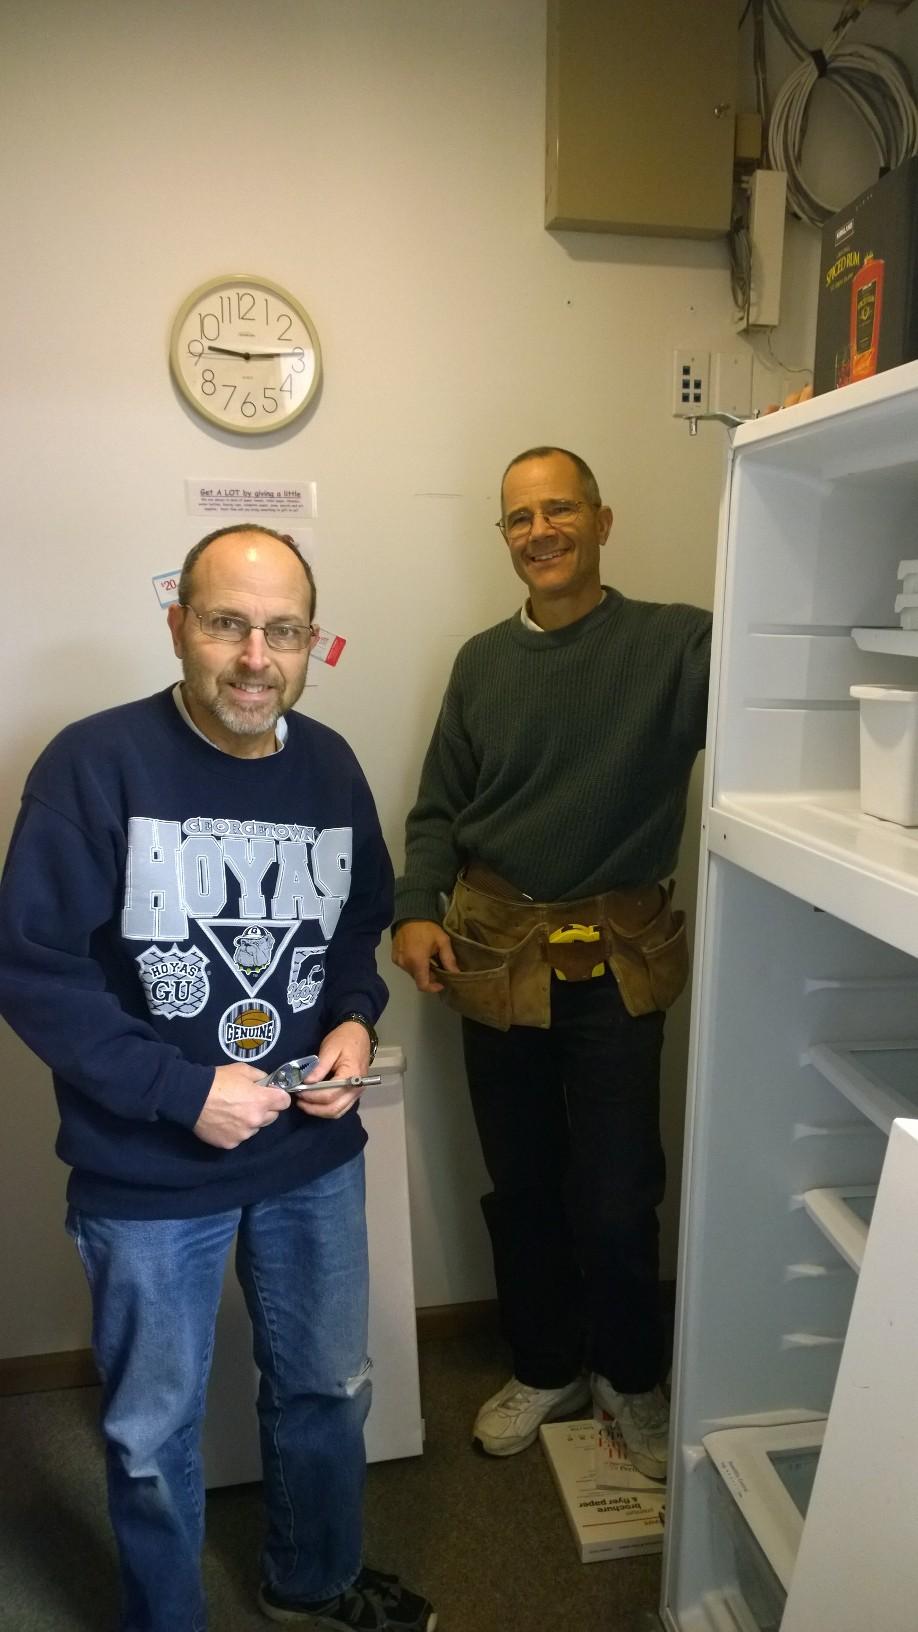 Steve and Tony. Handy men. Engineers.